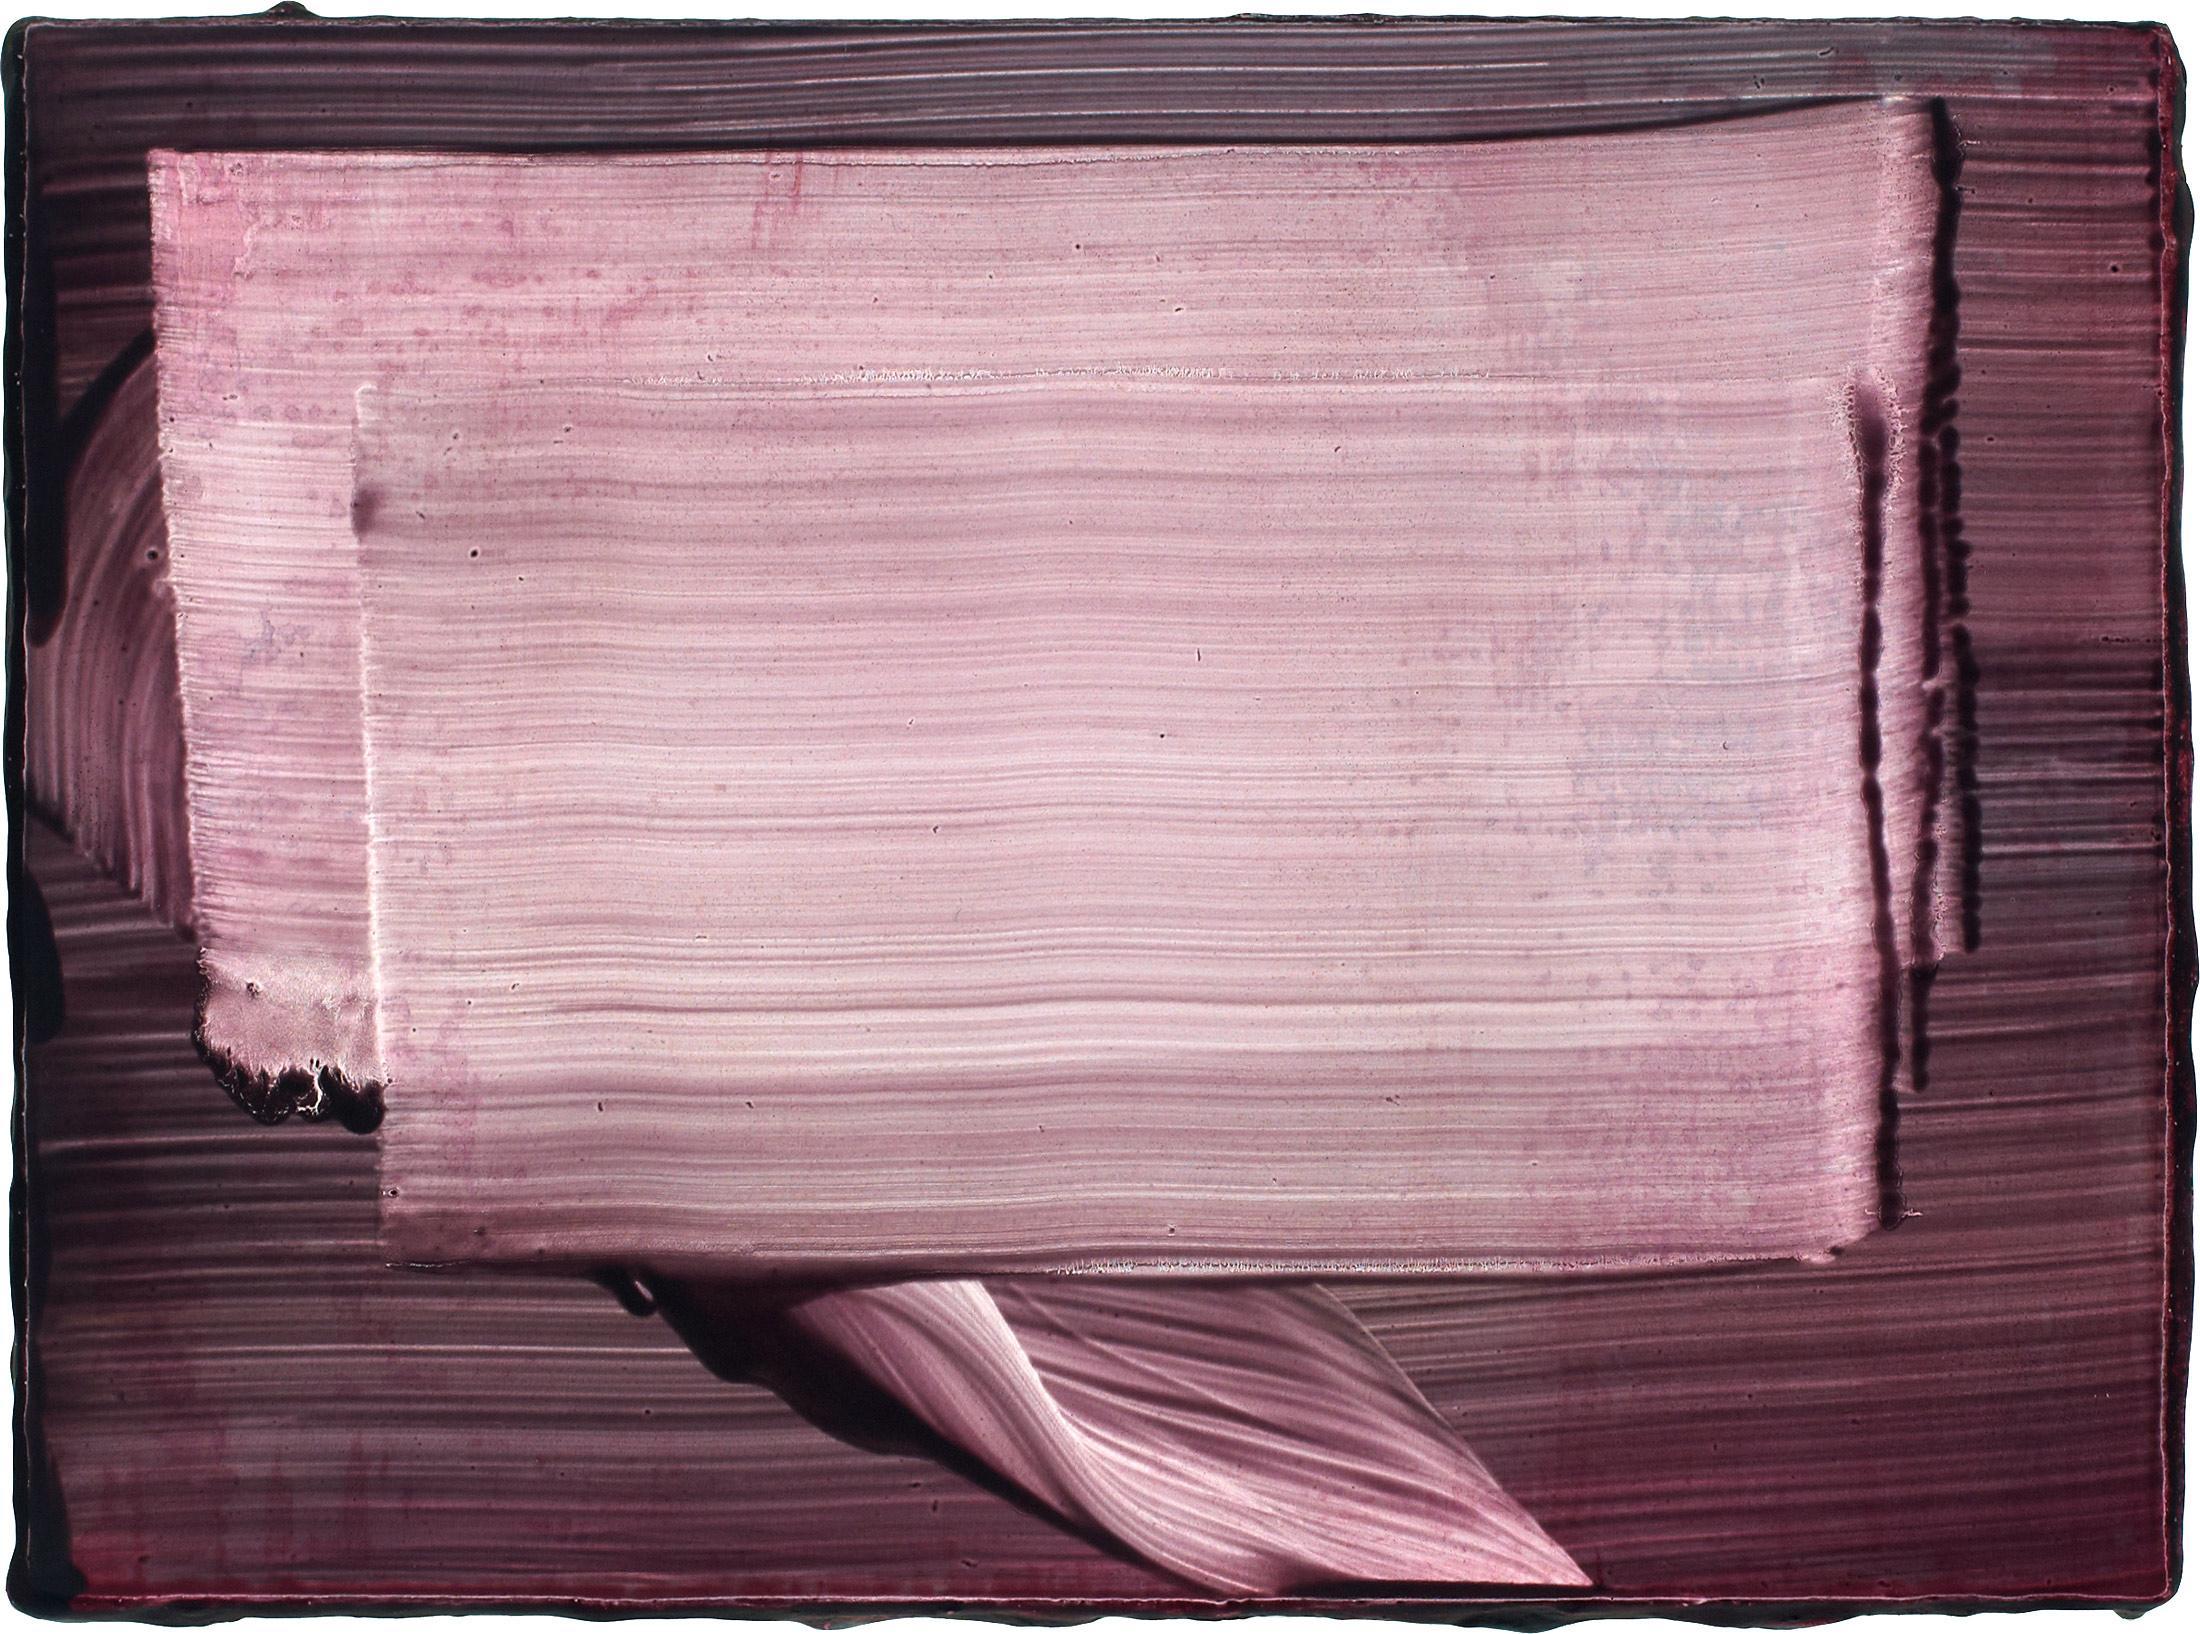 contemporary art daily, markus saile, aachen